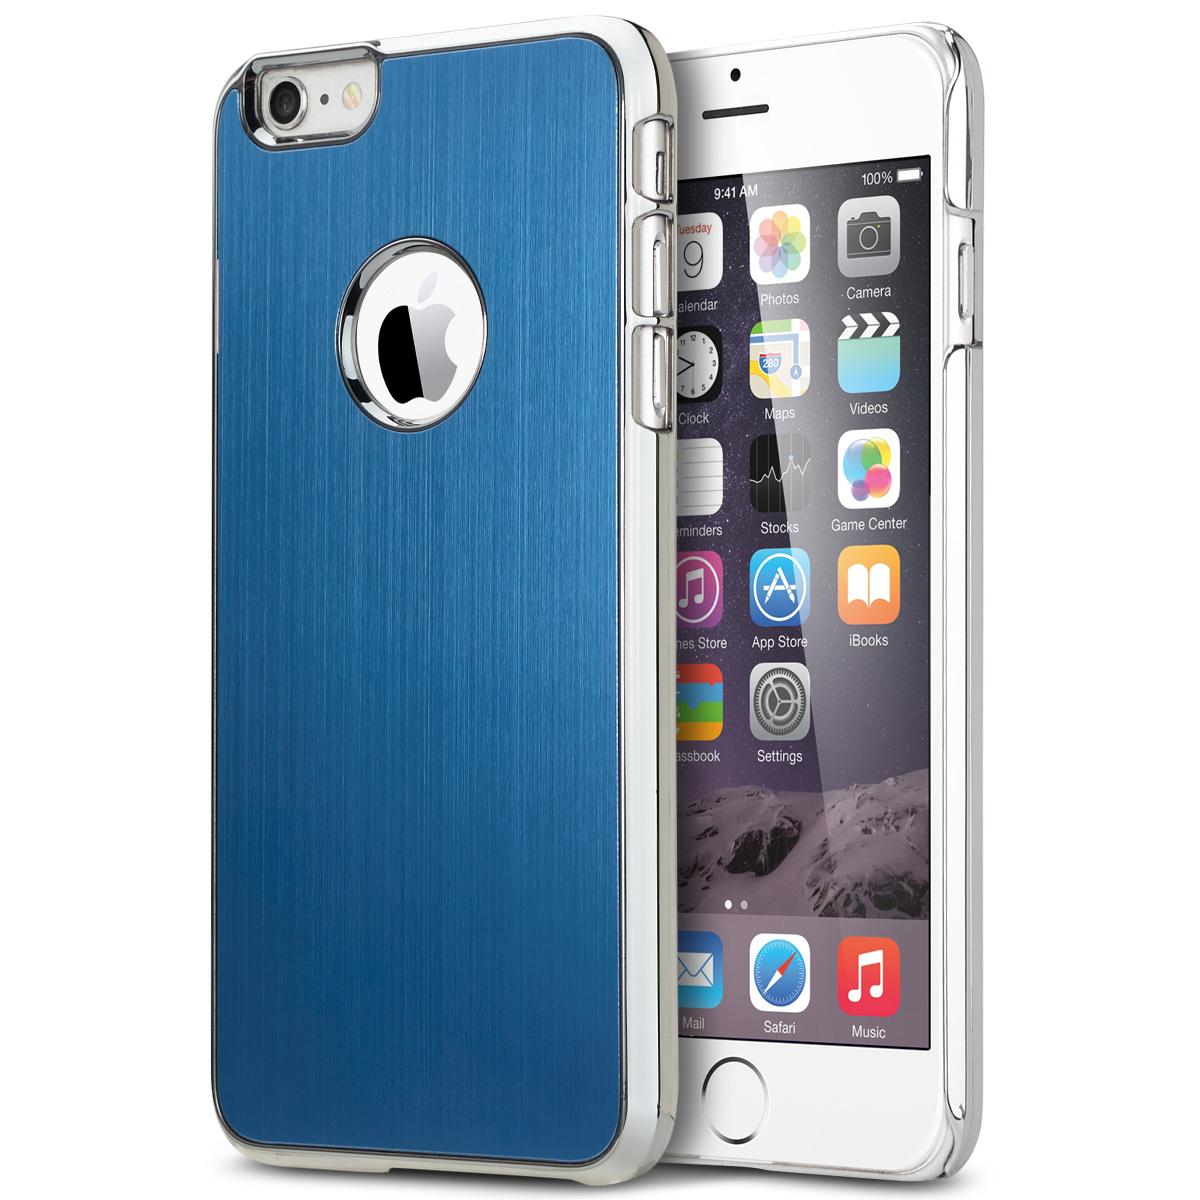 iPhone 6 Plus Case, ULAK Luxury Aluminum Chrome Coating Hybrid Hard Case Cover With PC Bumper for Apple iPhone 6s Plus / 6 Plus 5.5 Inch